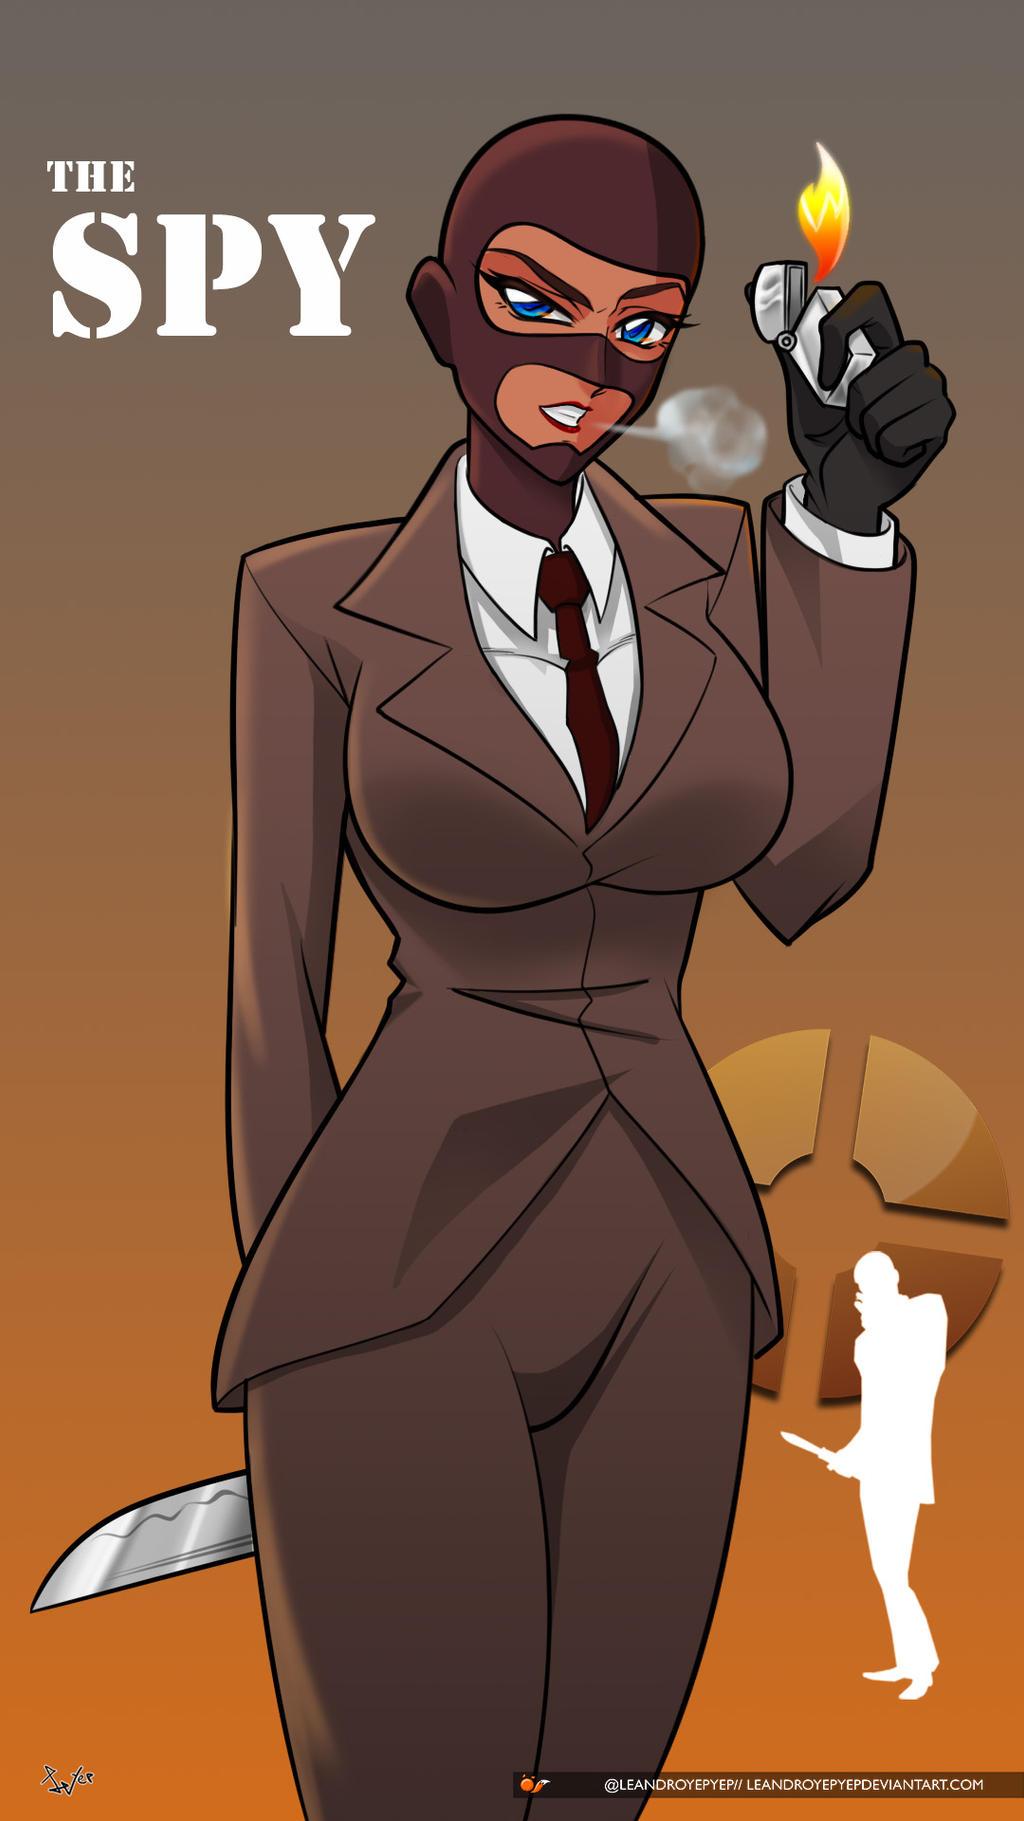 Spy Fan Art Team Fortress 2 05 By Leandroyepyep On Deviantart